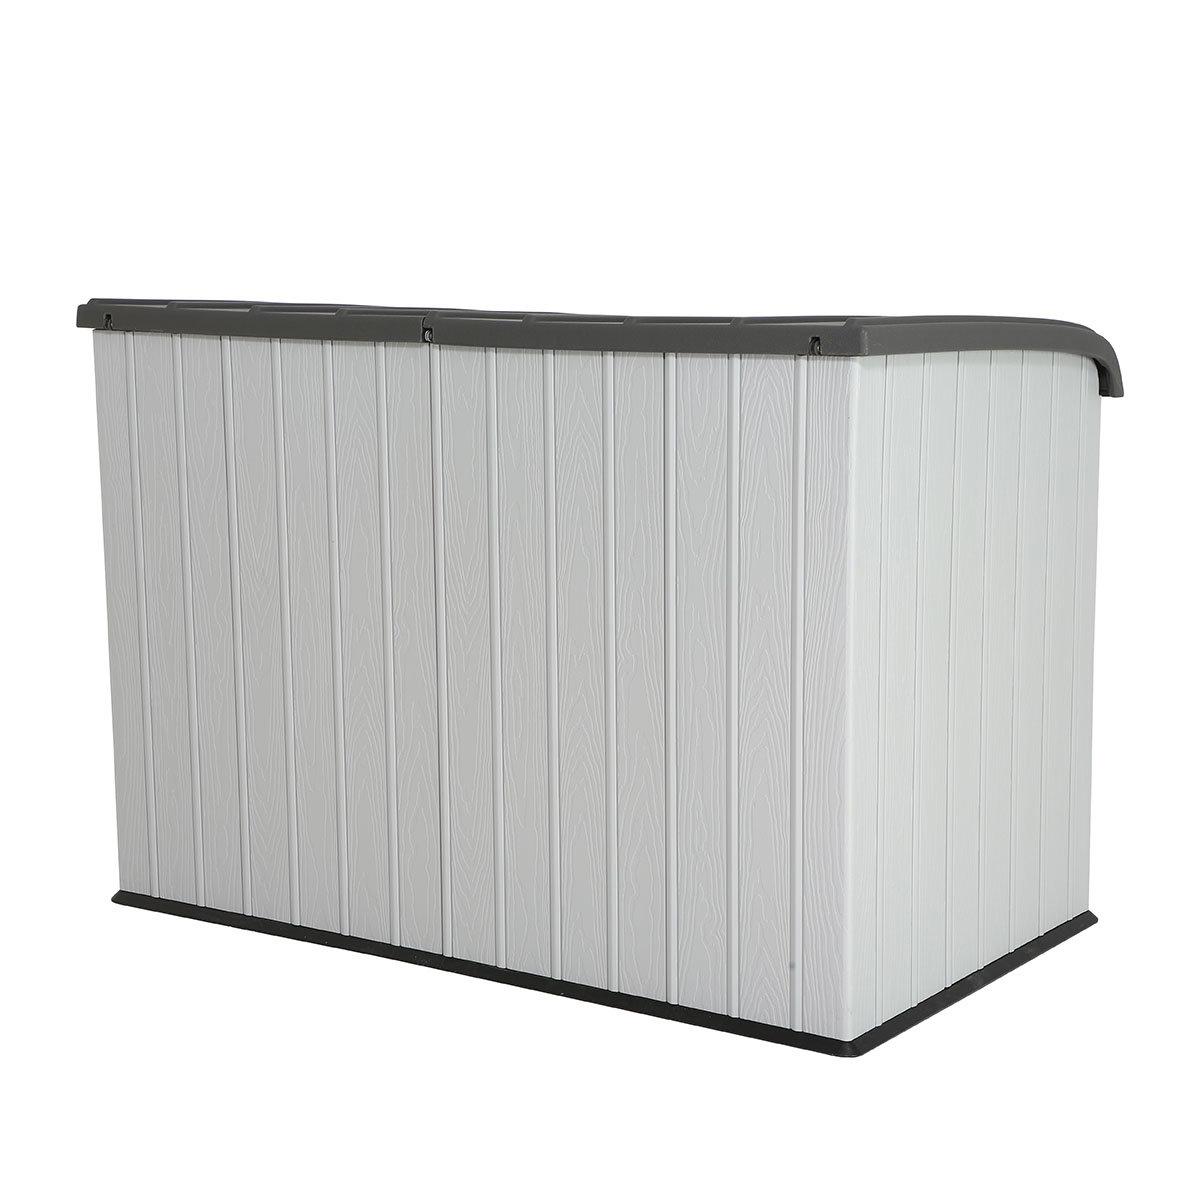 Gerätebox-Mülltonnenbox, 132x191x108 cm, grau | #2